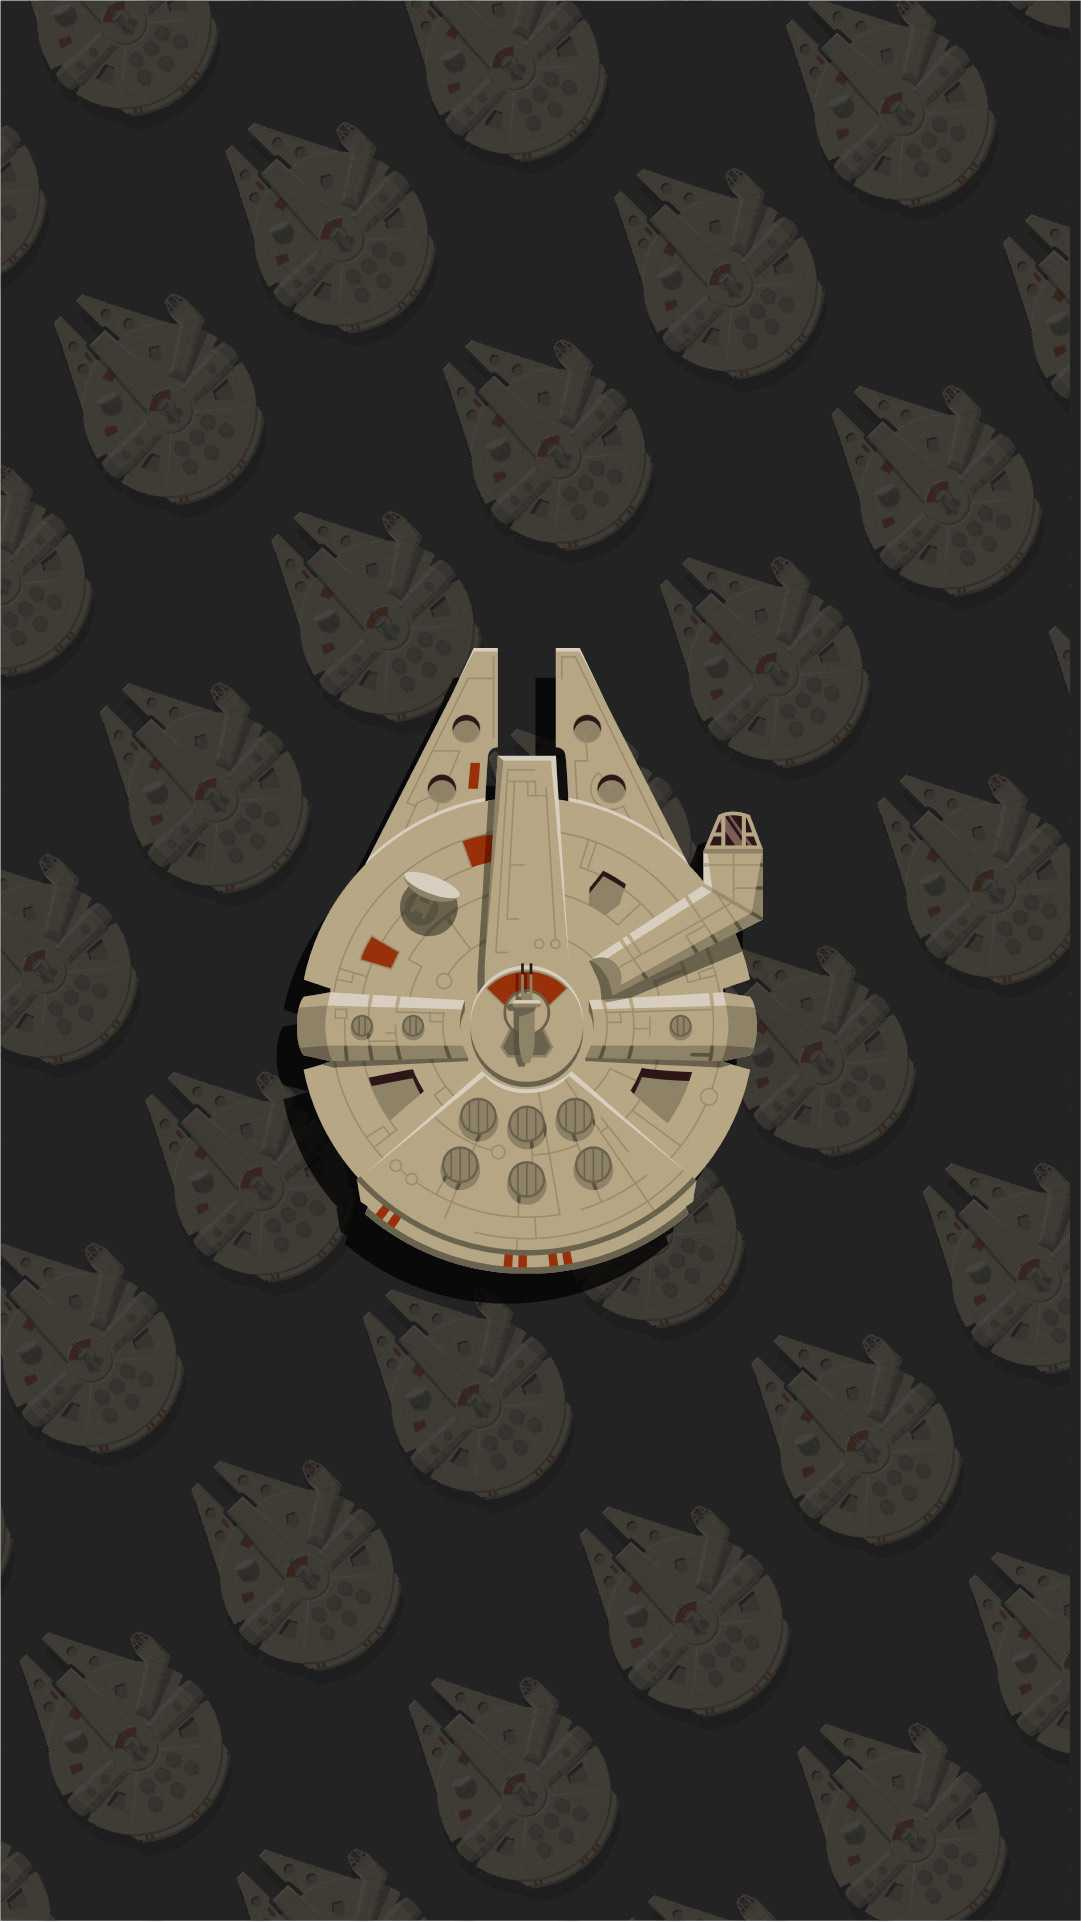 4k Star Wars Wallpaper Ixpap